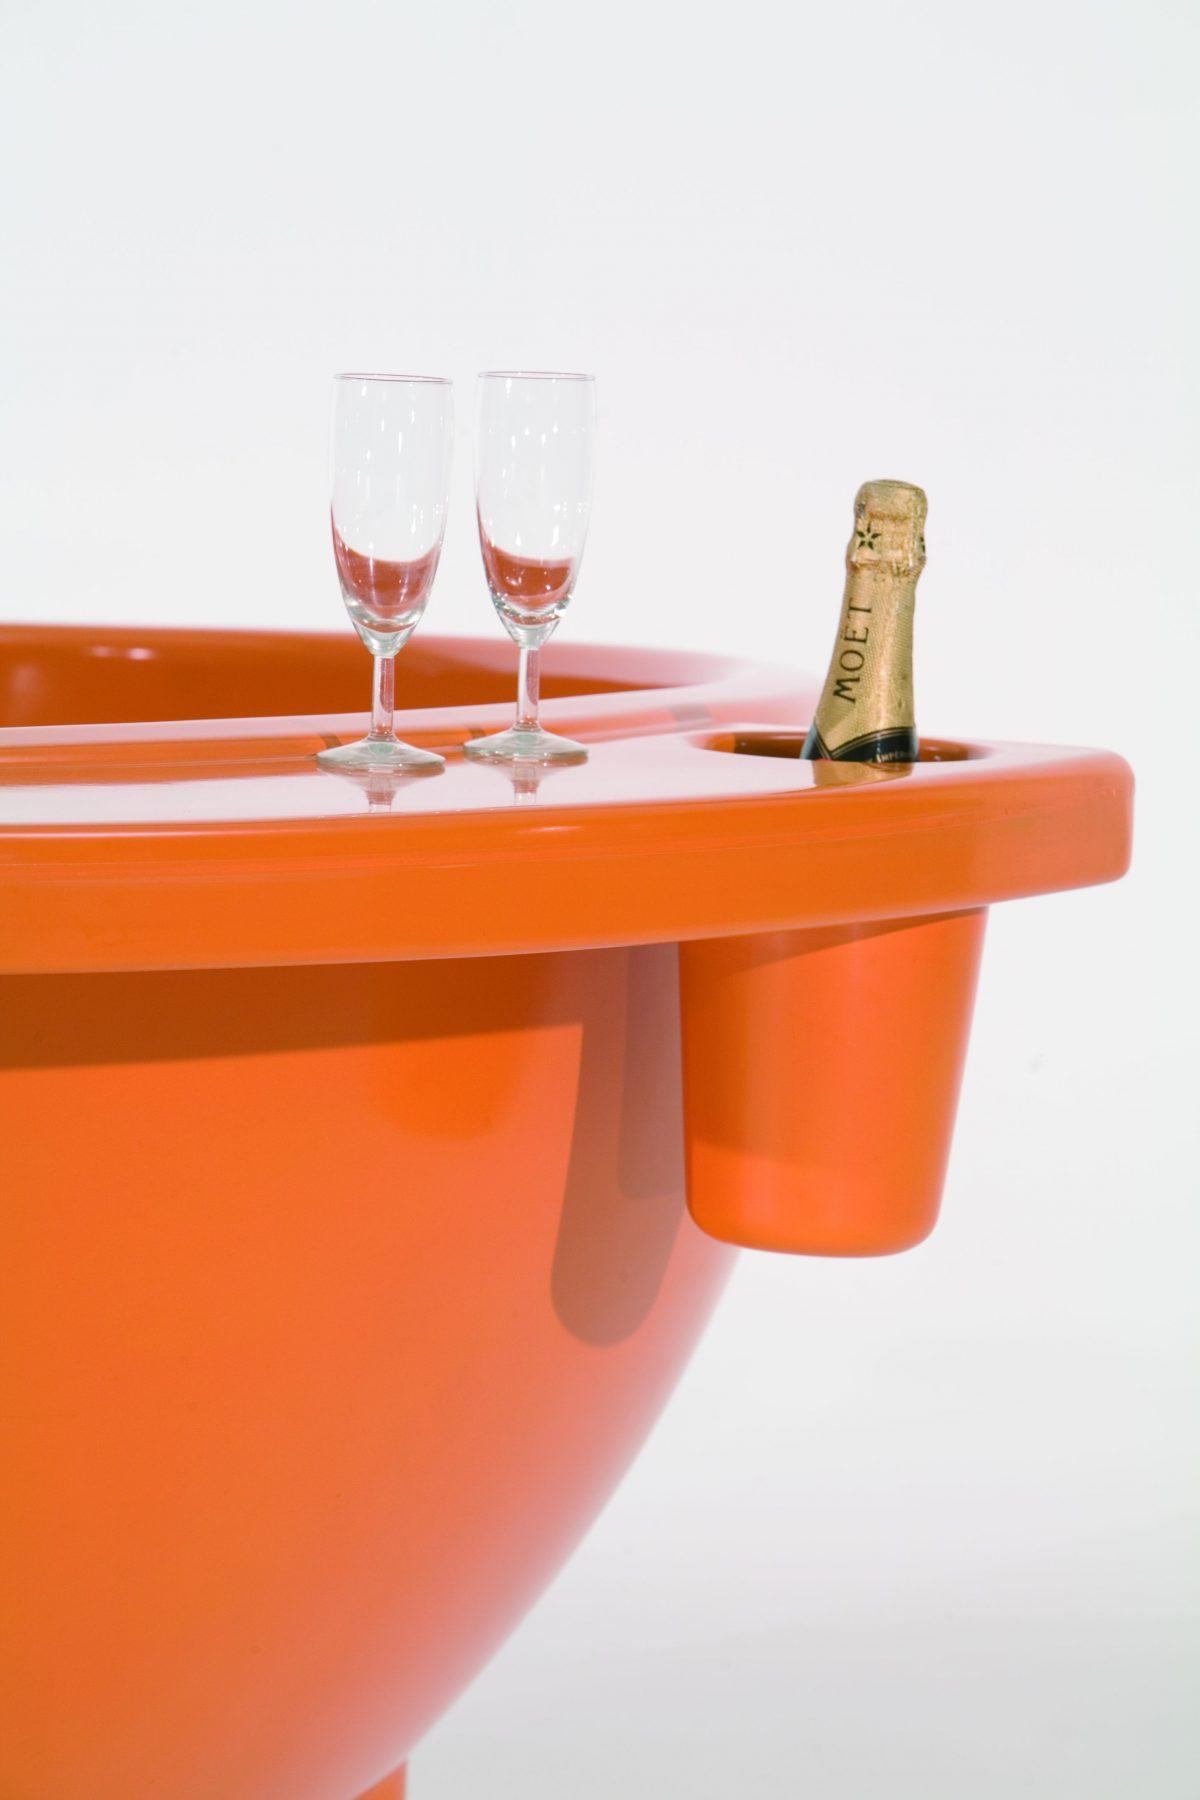 Dutchtub Original Weltevree Hottub Luxe Champagnekoeler Dutch Design